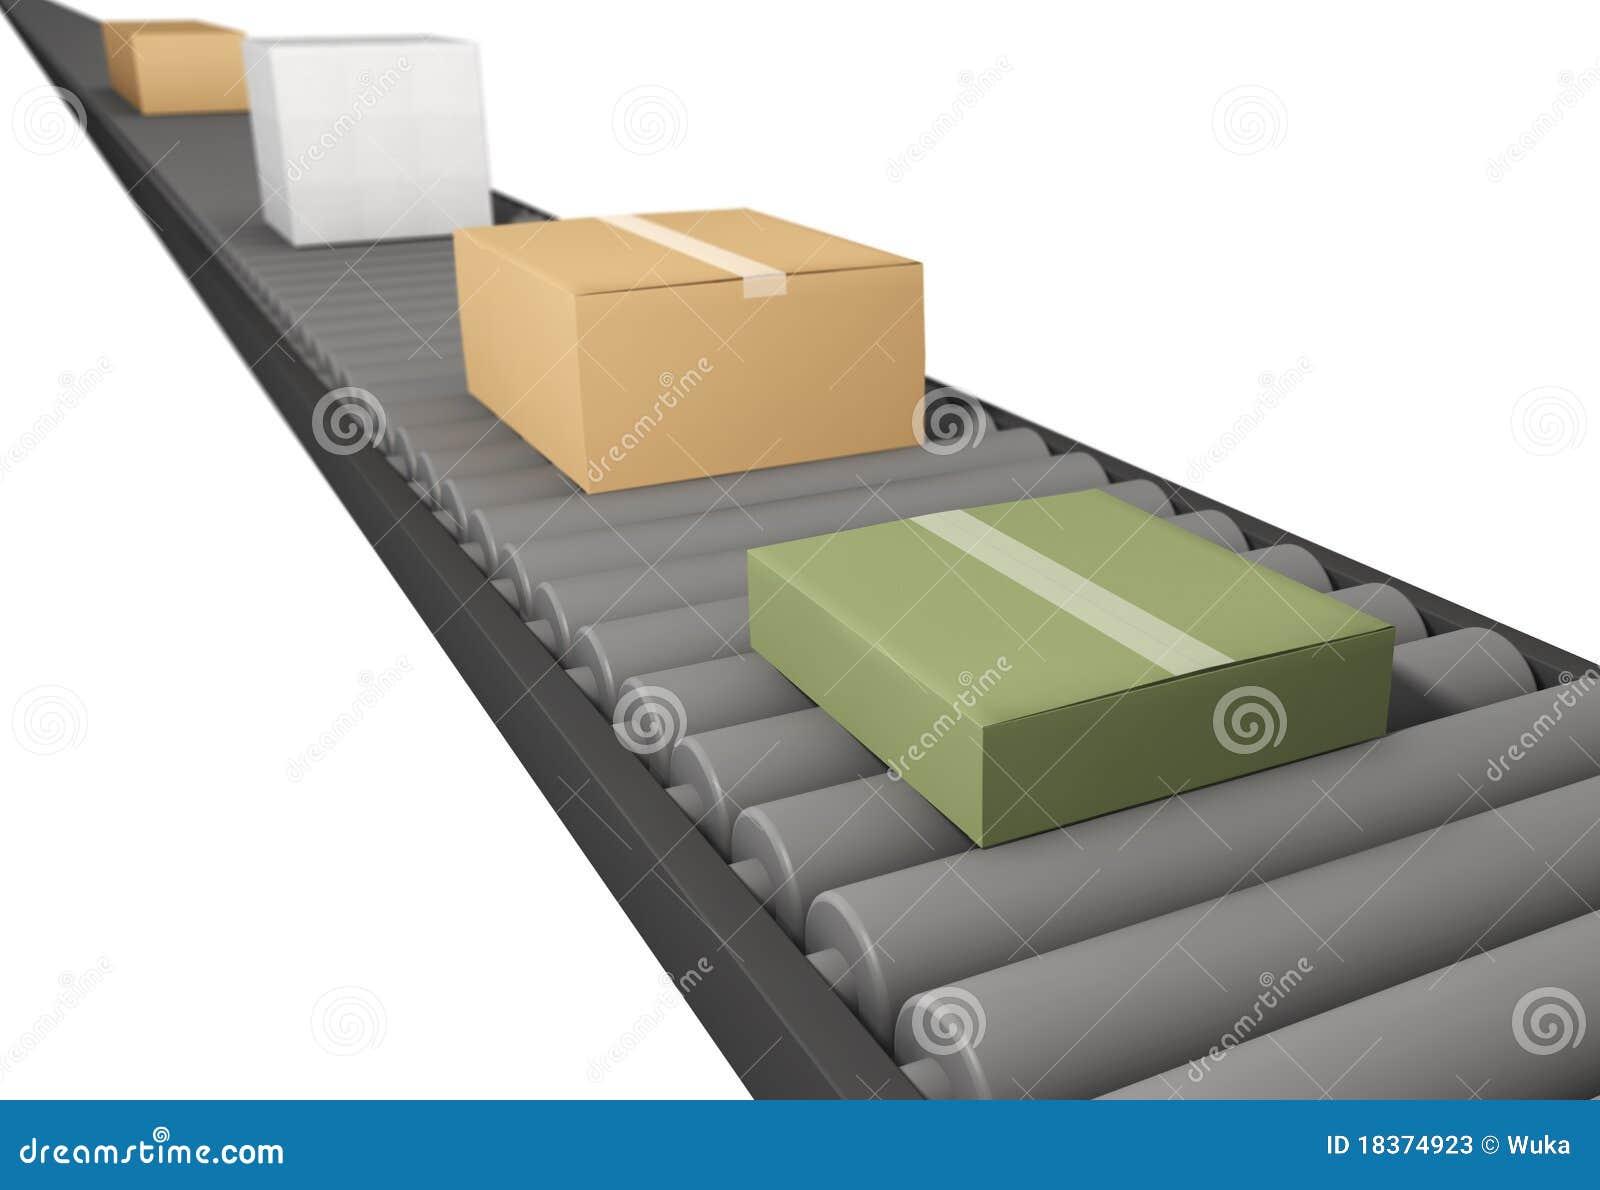 how to change a conveyor belt